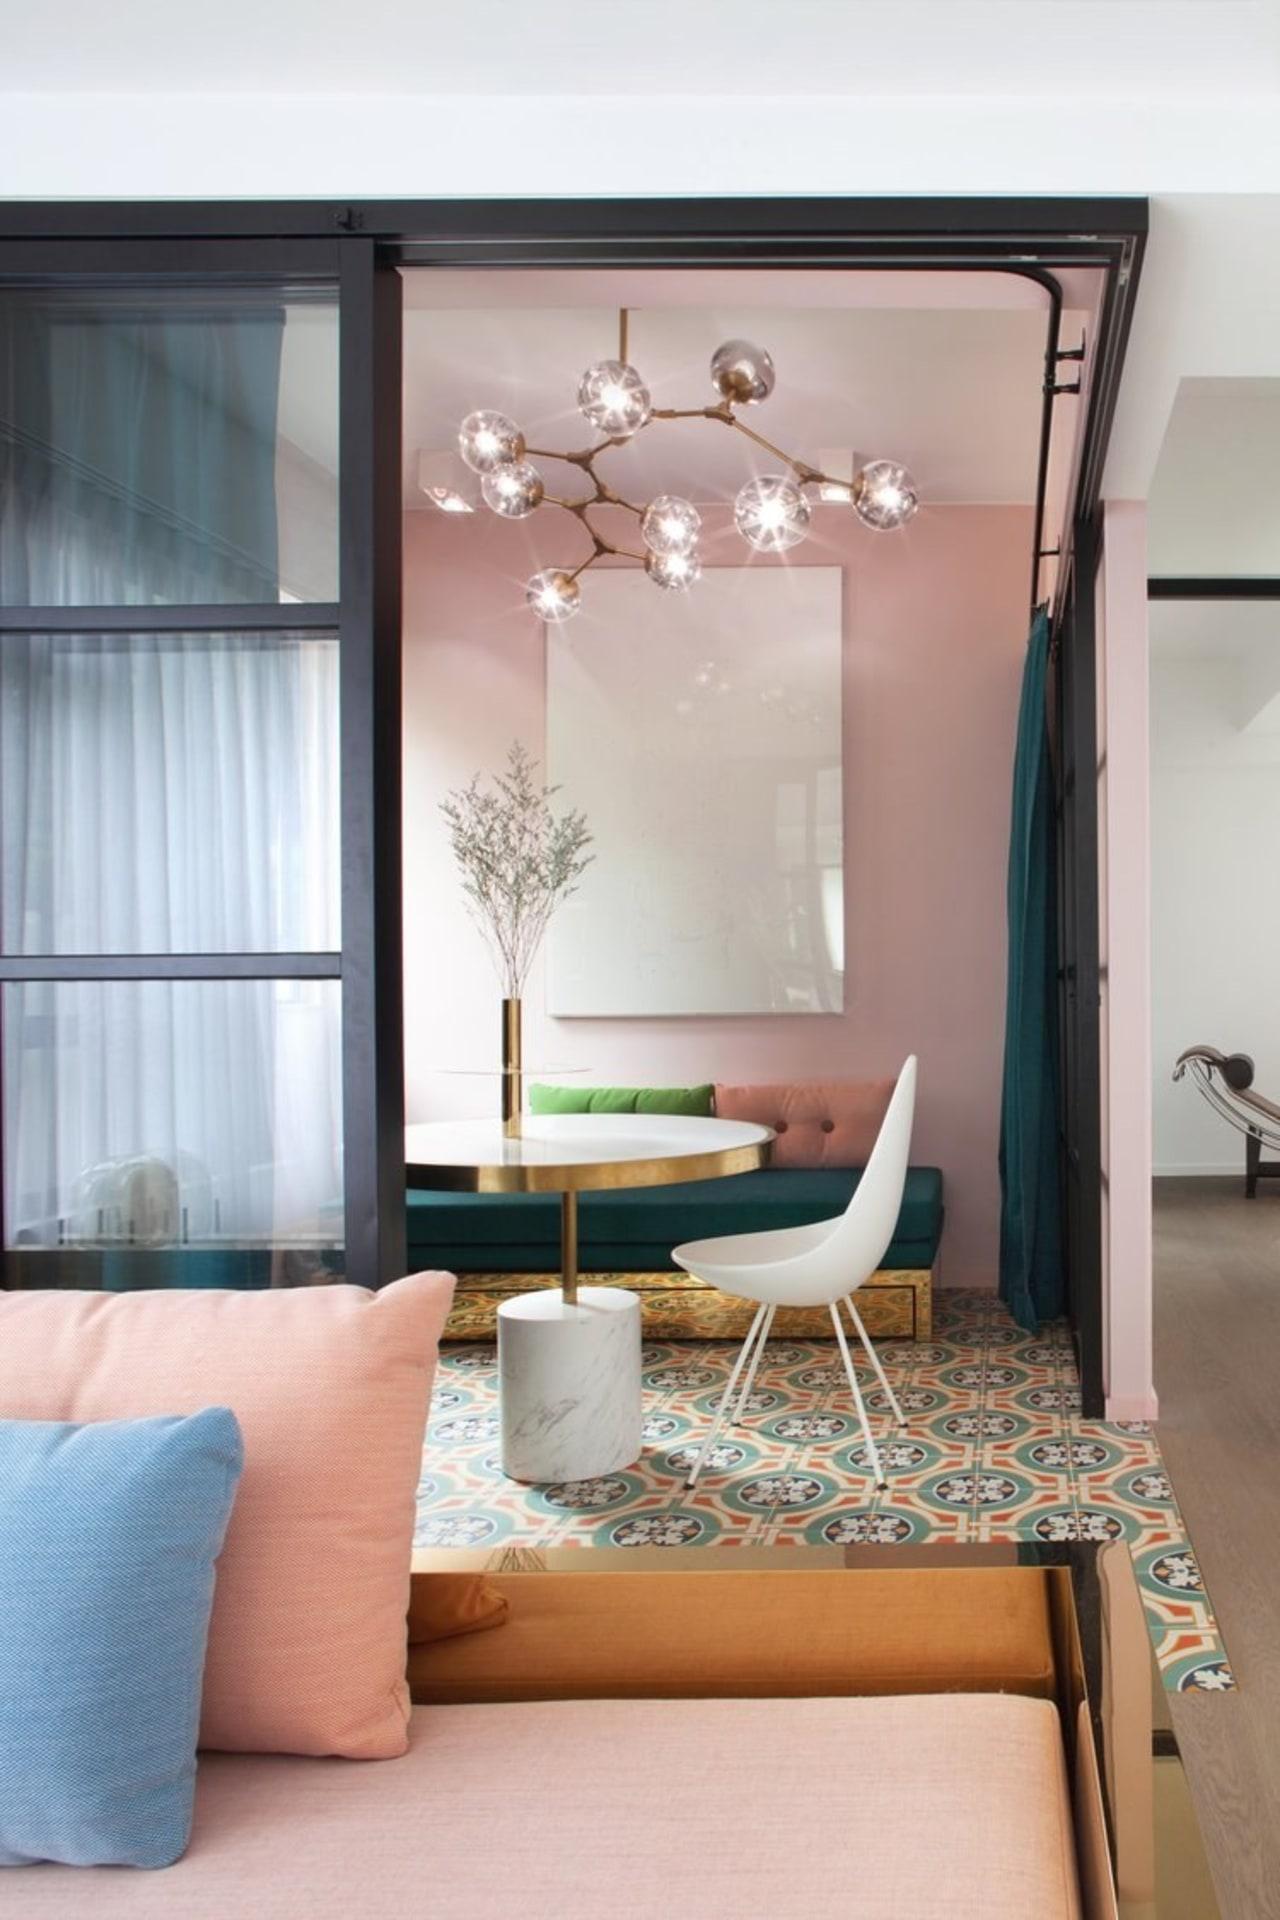 这间书房巧用腮红粉和婴儿蓝的搭配,营造出一种甜美愉悦的氛围。 ceiling, floor, furniture, home, interior design, living room, room, table, wall, window, gray